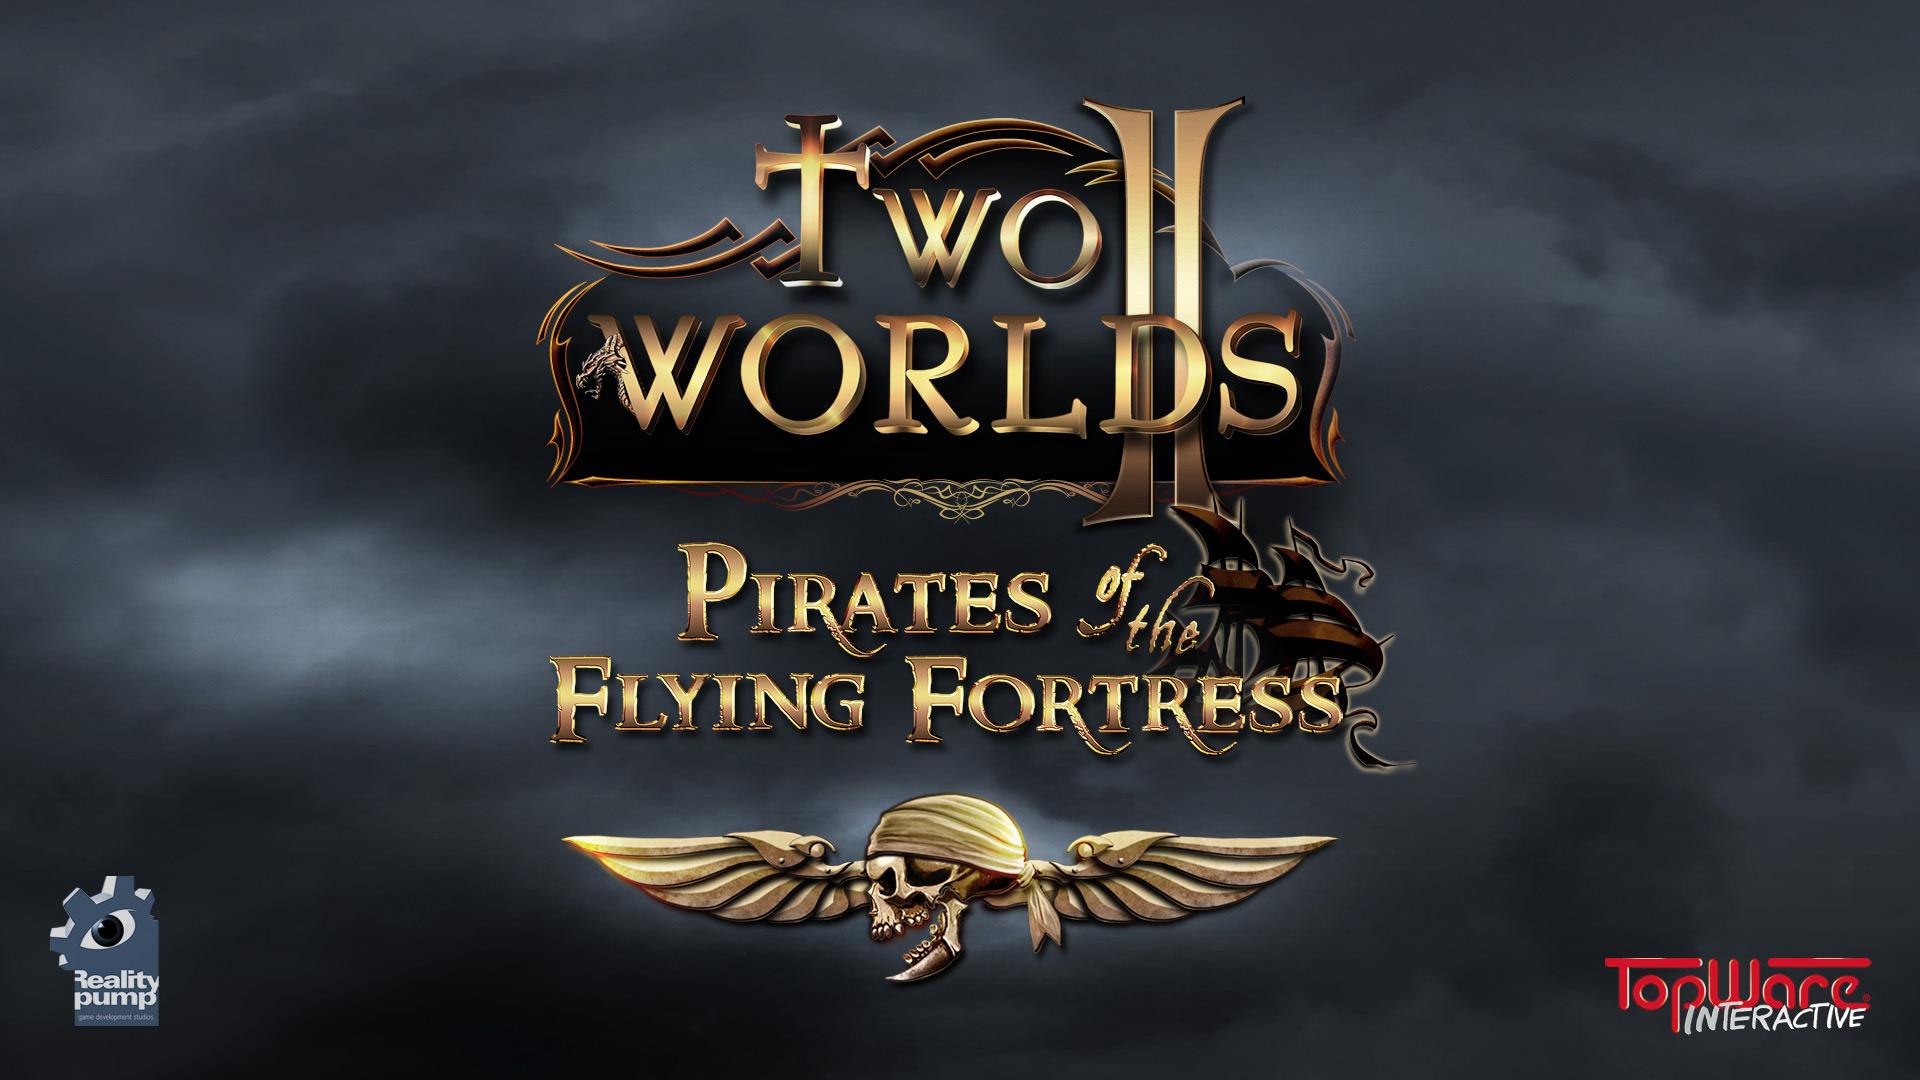 Two Worlds 2: Pirates of the Flying Fortress: Schriftzug zum Piraten Addon.